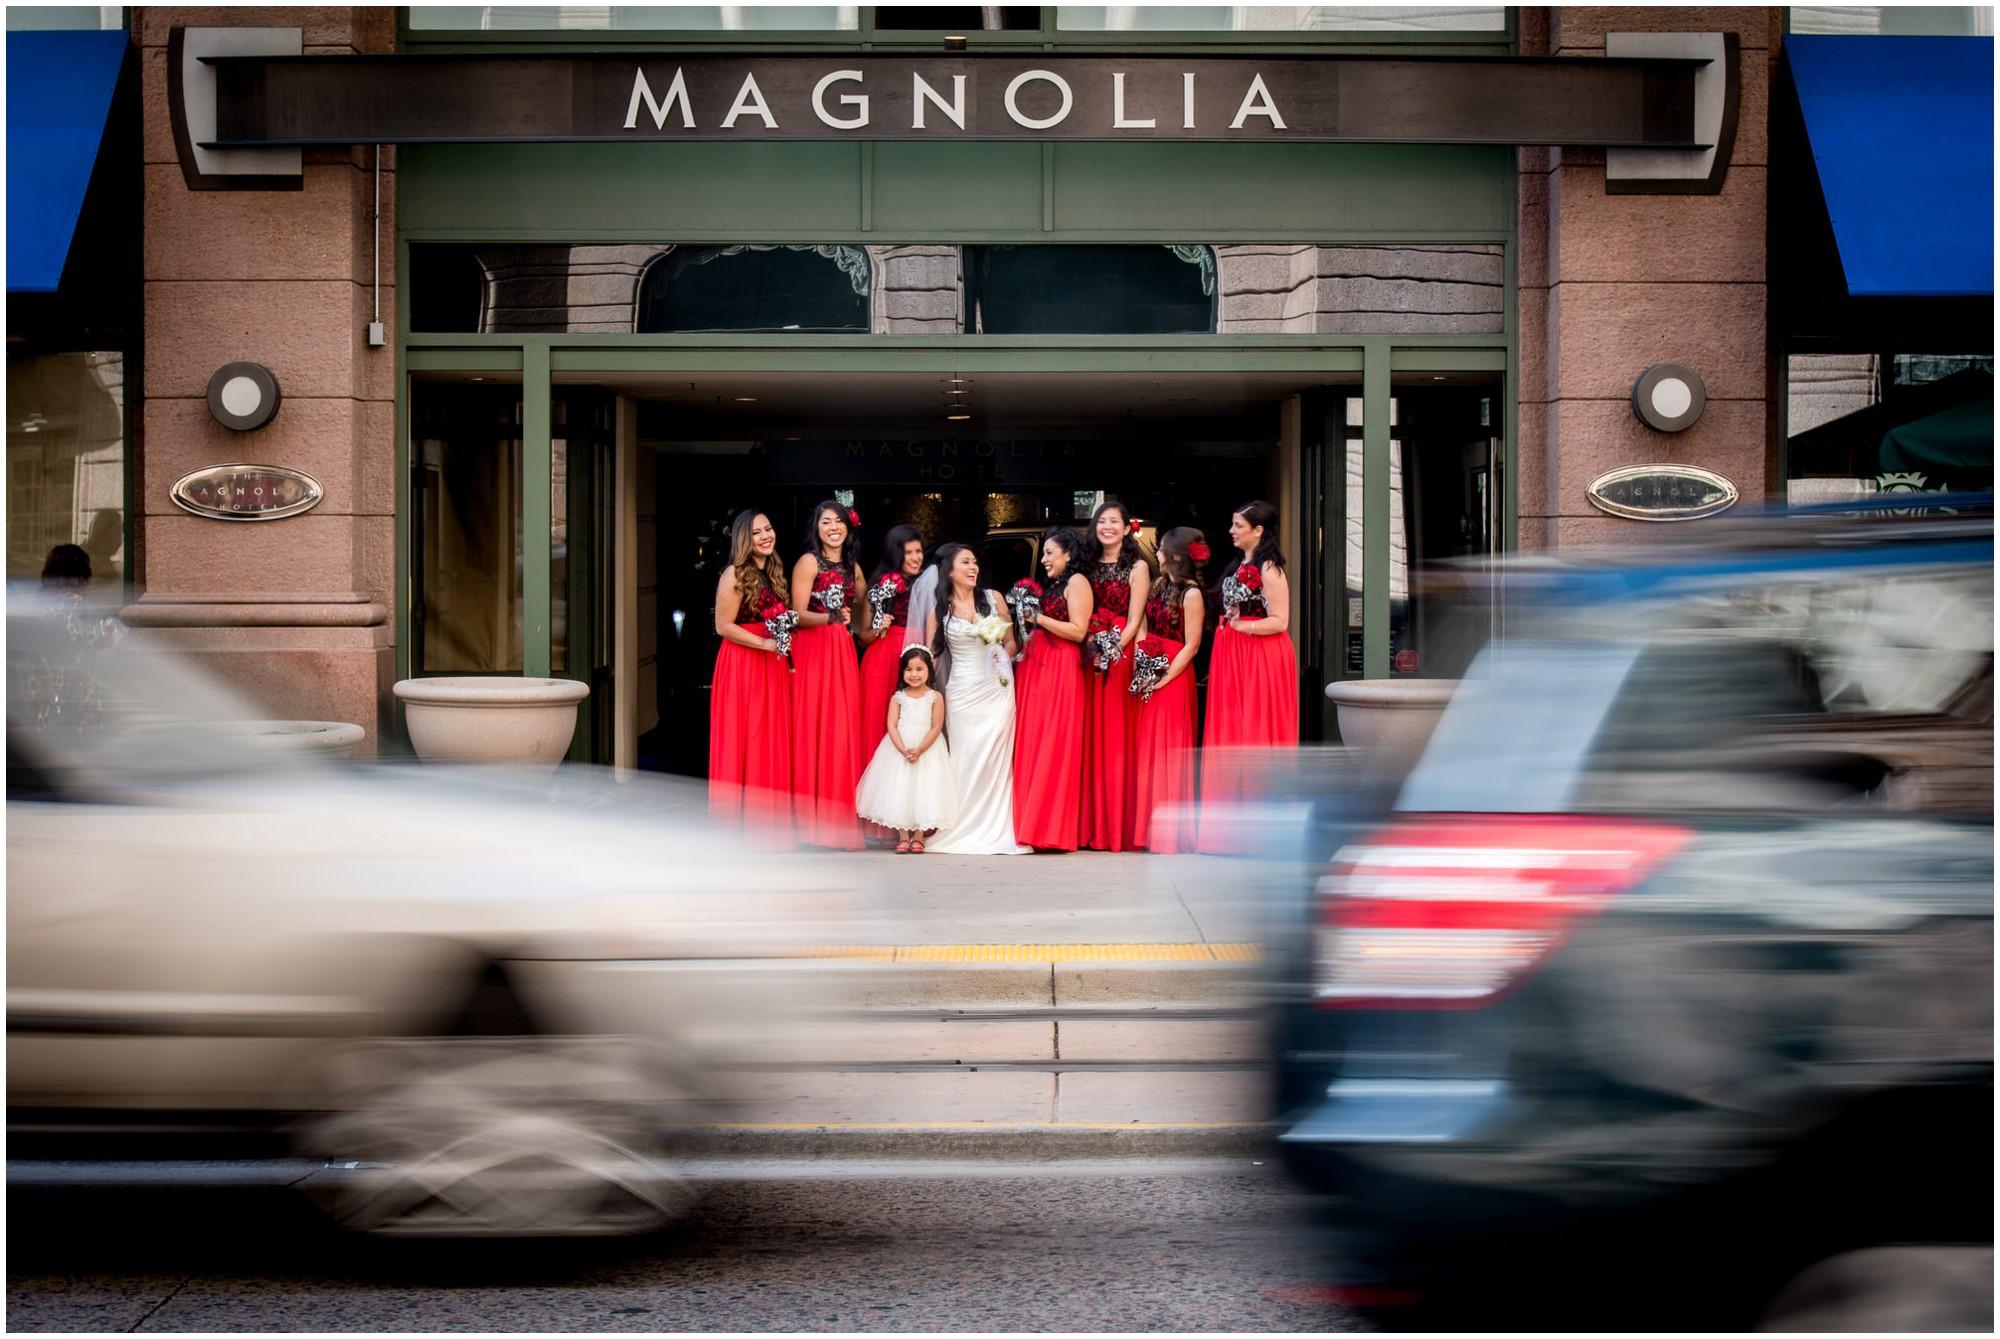 340-Downtown-Denver-Magnolia-Hotel-Wedding-photography.jpg